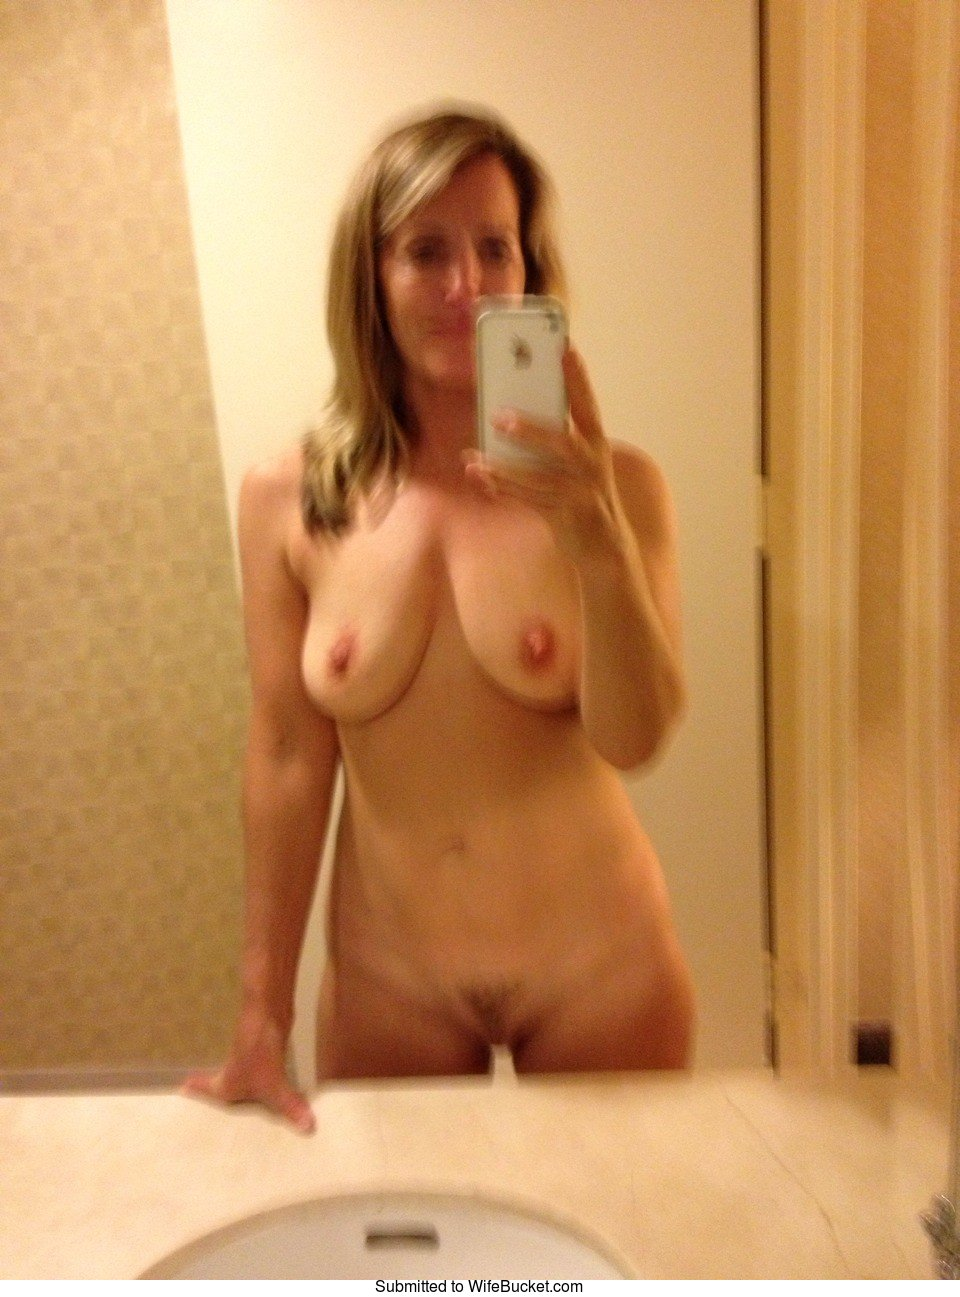 Wifebucket  Mature Women And Their Naughty Naked Selfies-4793